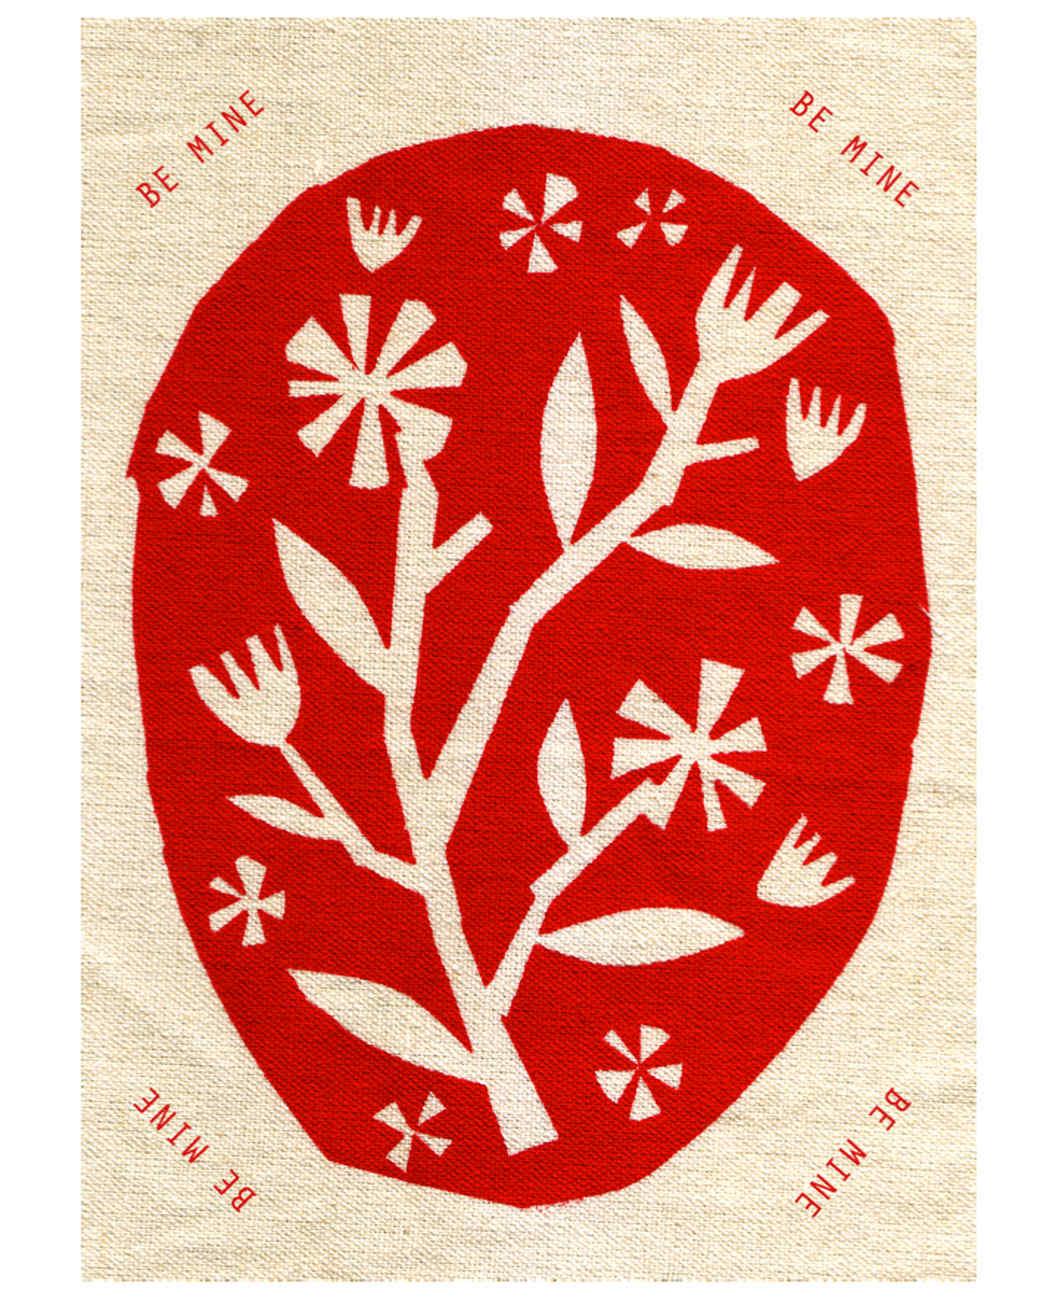 lena-corwin-valentine-clipart-card-2-0114.jpg